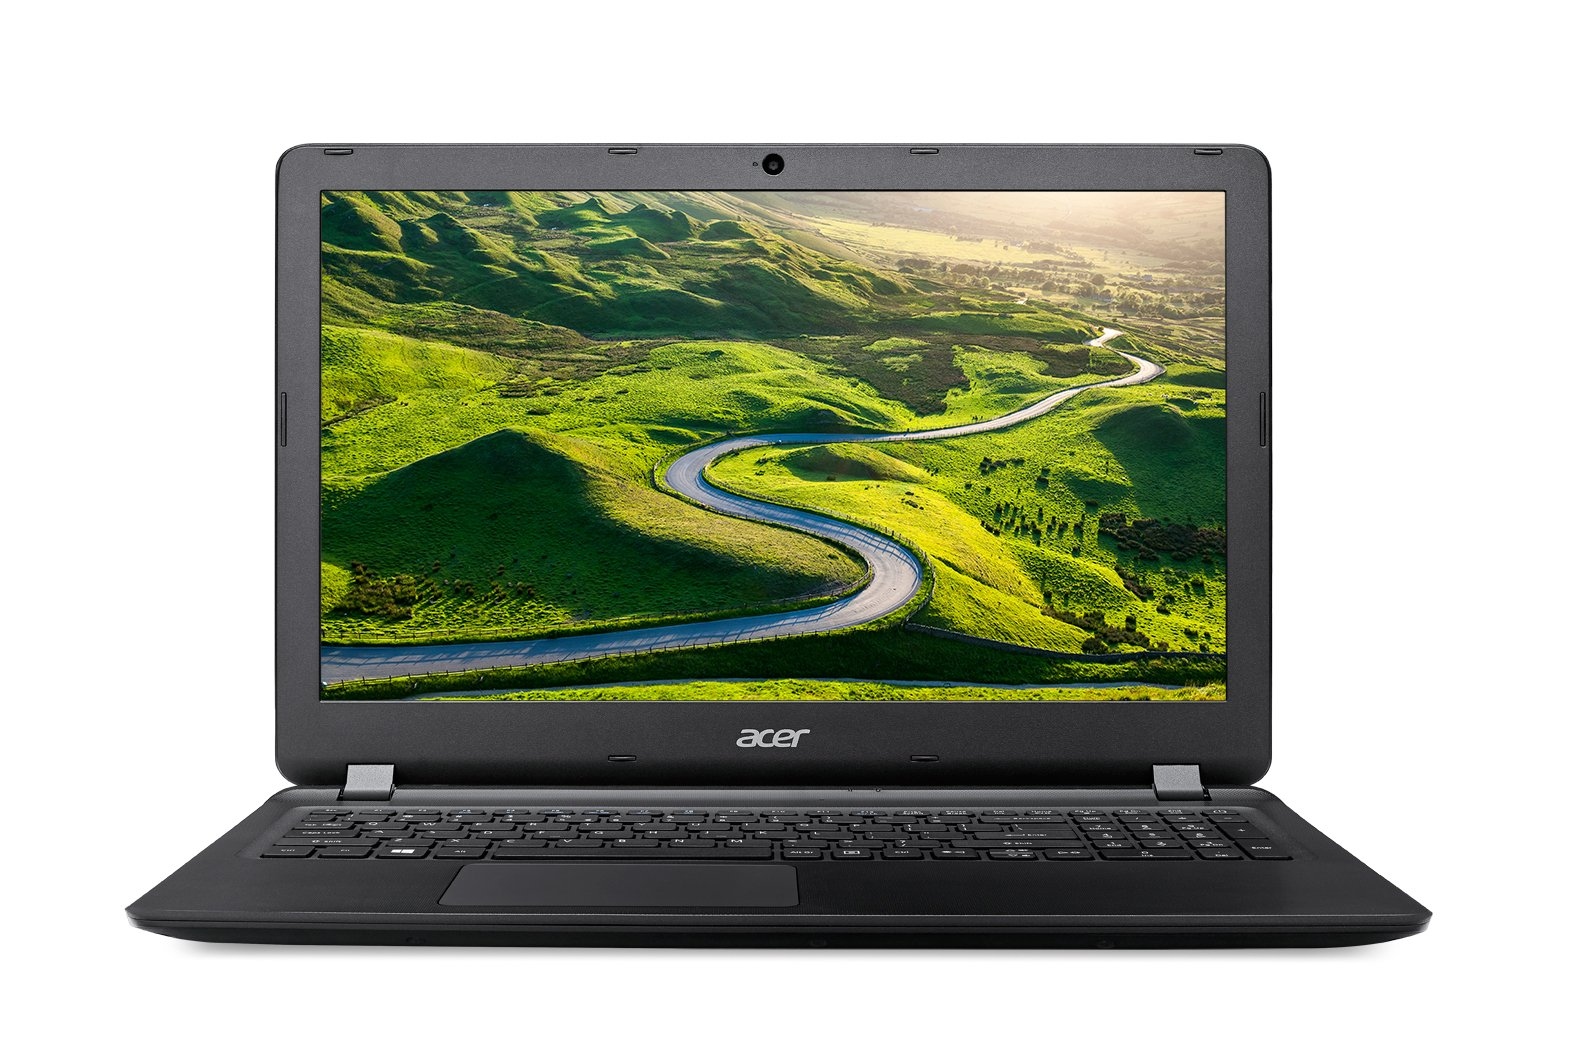 "Acer Aspire ES 15 (ES1-533-C3KX) Celeron N3350/4 GB+N/A/128 GB SSD+N/DVDRW/HD Graphics /15.6"" FHD LED matný/W10 H/Black"